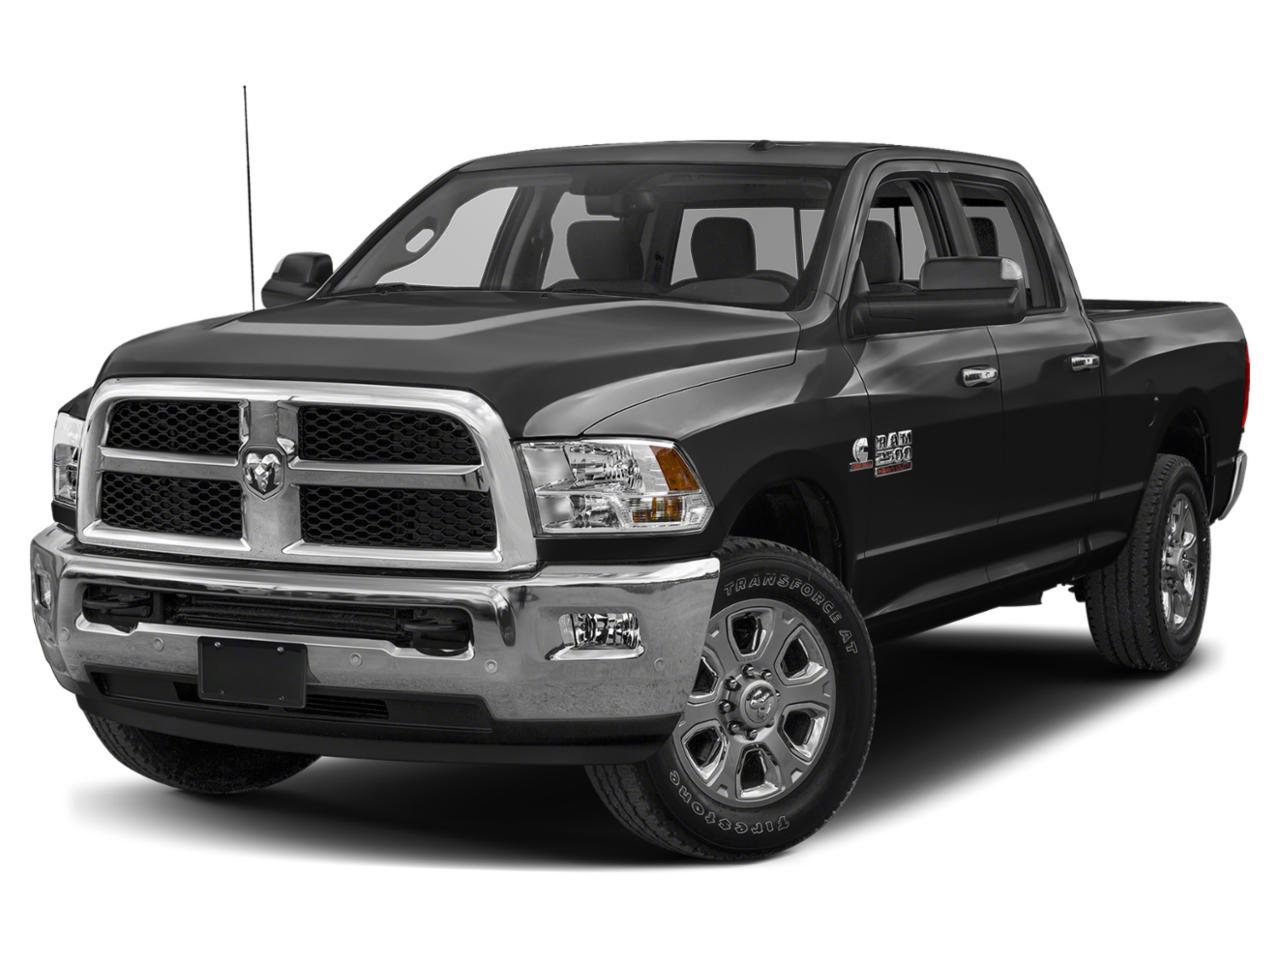 2018 Ram 2500 Vehicle Photo in Selma, TX 78154